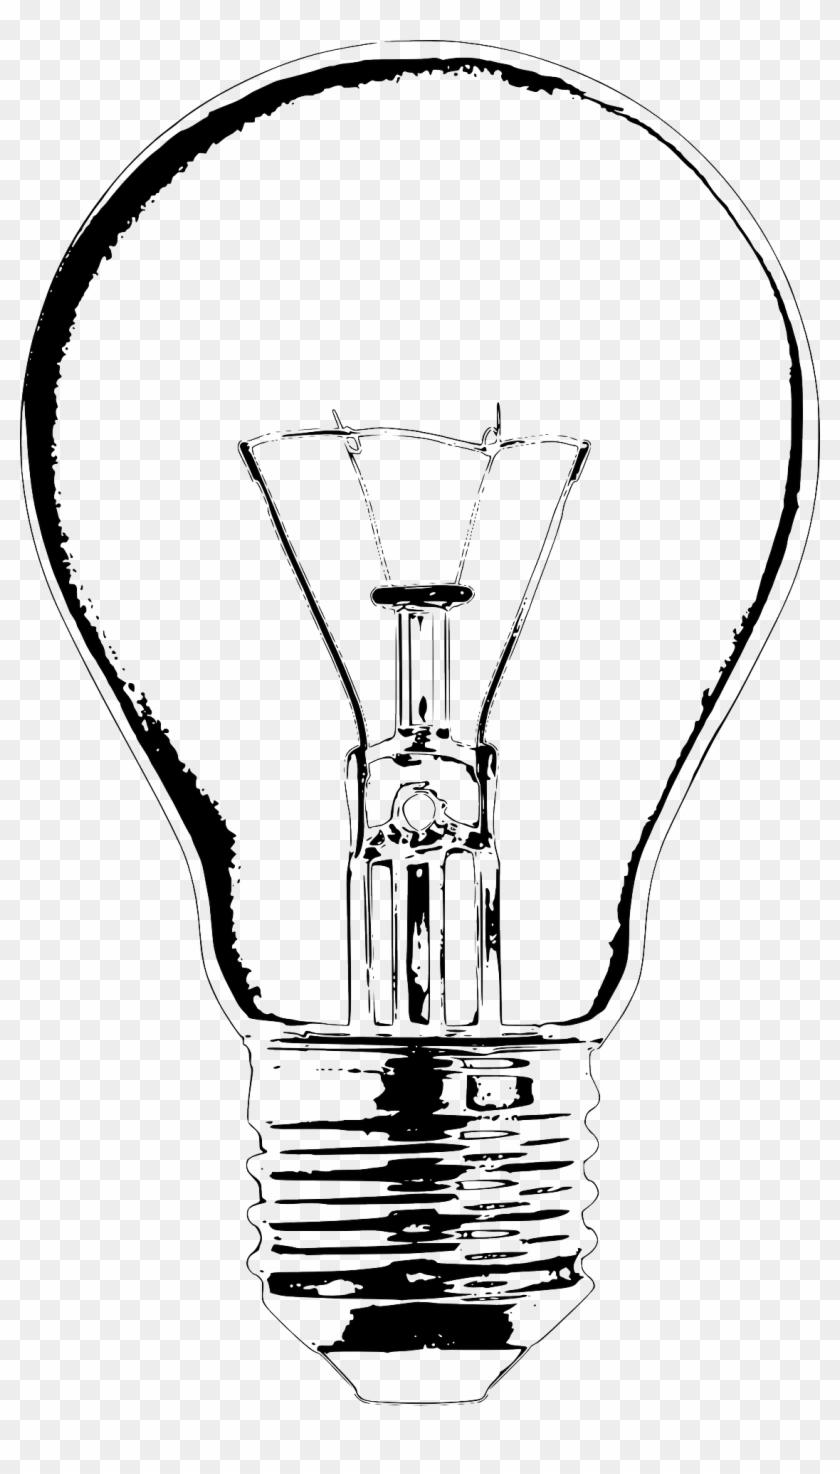 Incandescent Light Bulb Lamp Clip Art - Light Bulb Vector Sketch #453330